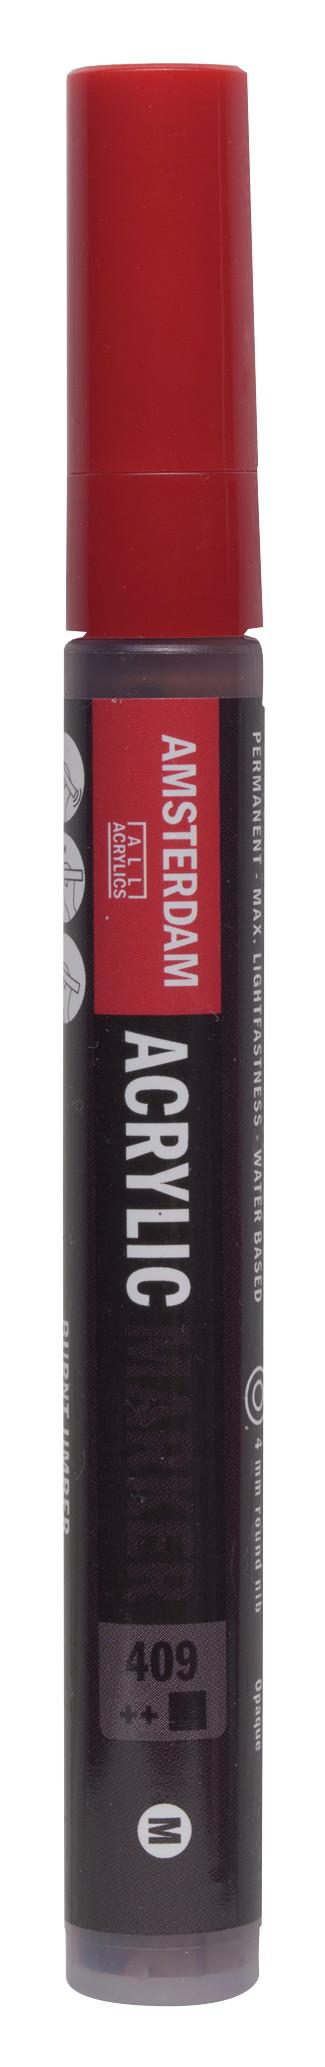 Amsterdam Acrylic Marker 4 mm Burnt Umber 409